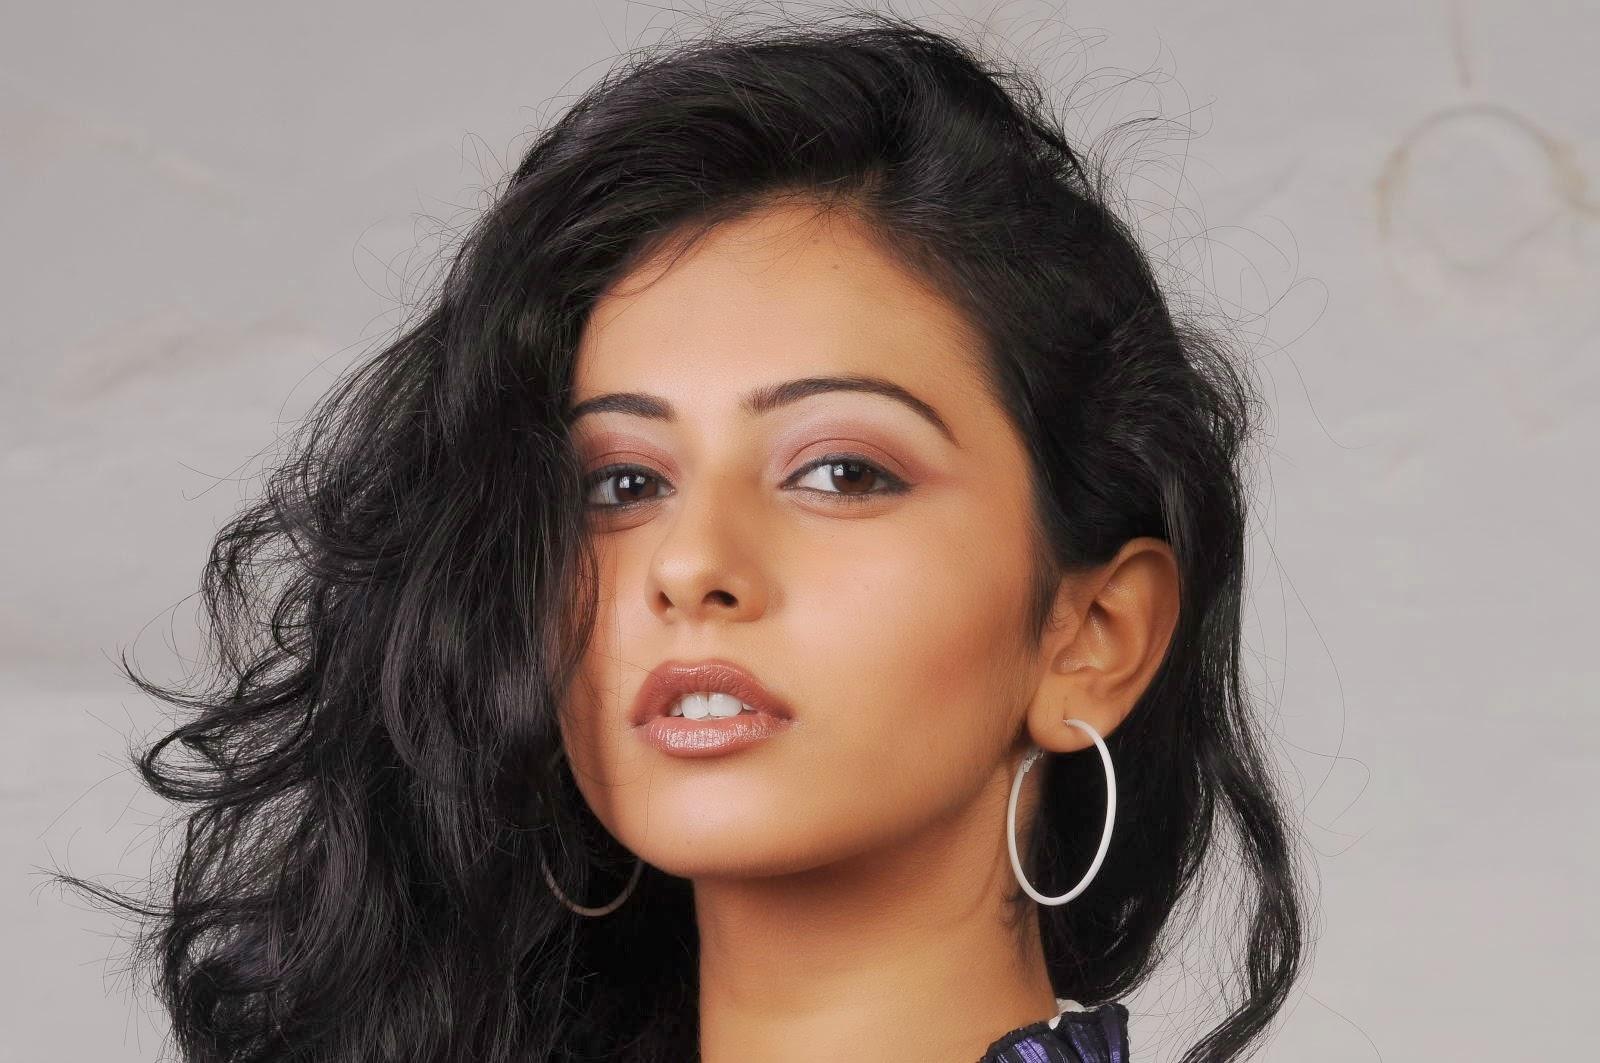 wallpaper zony: rakul preet singh actress latest full hd wallpaers